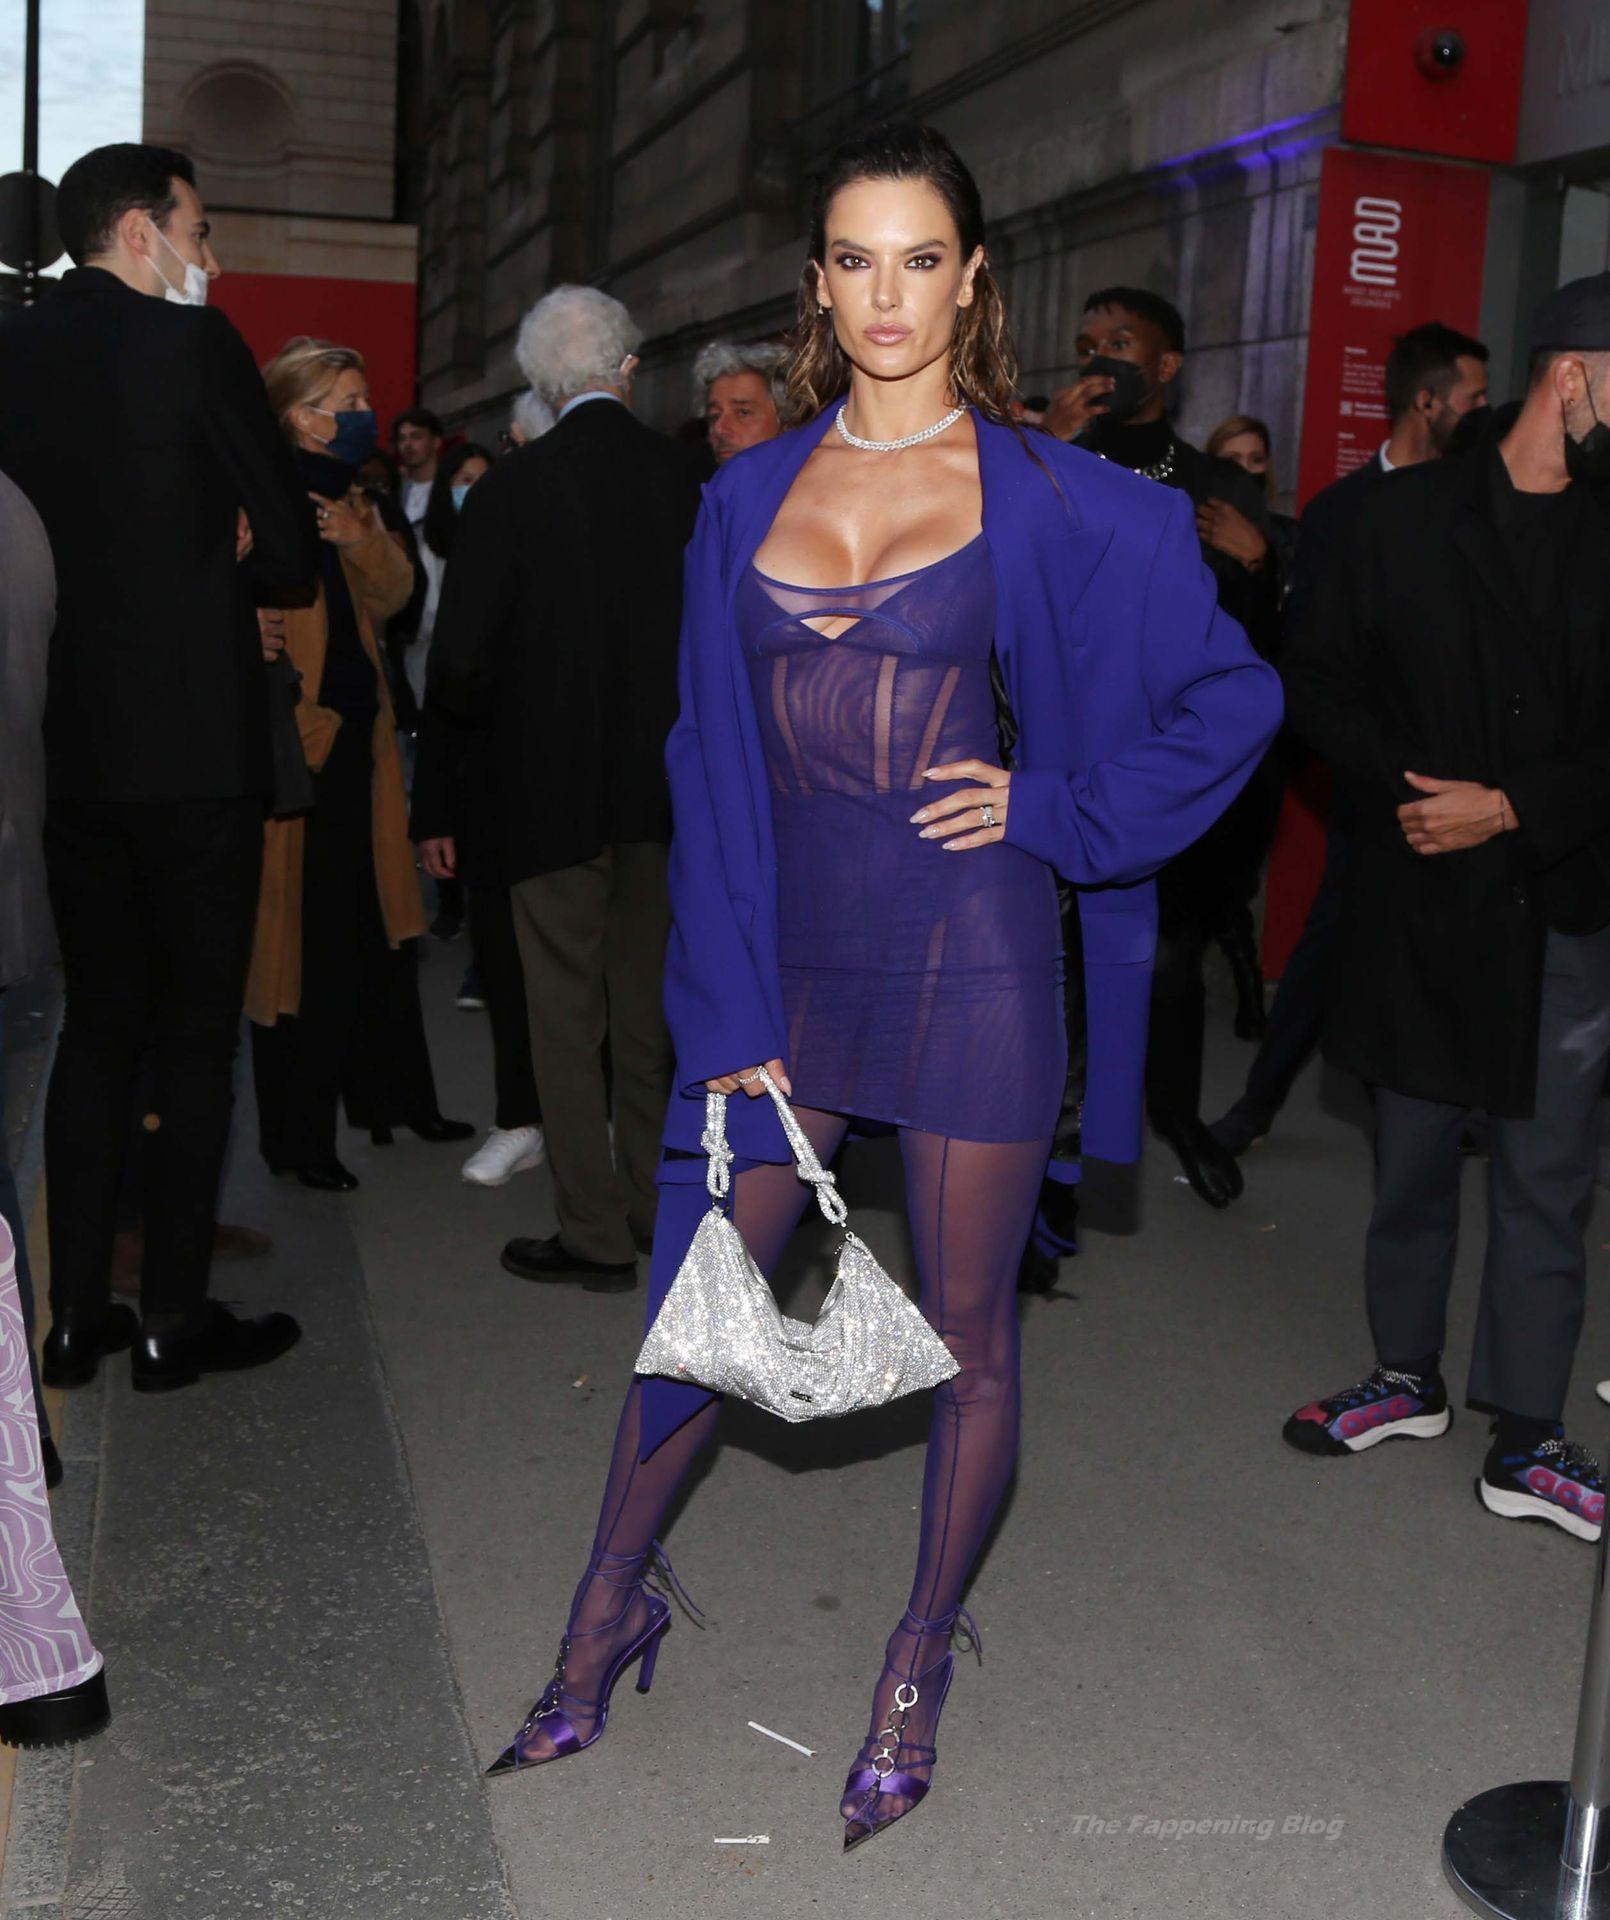 Alessandra-Ambrosio-Sexy-The-Fappening-Blog-51-1.jpg